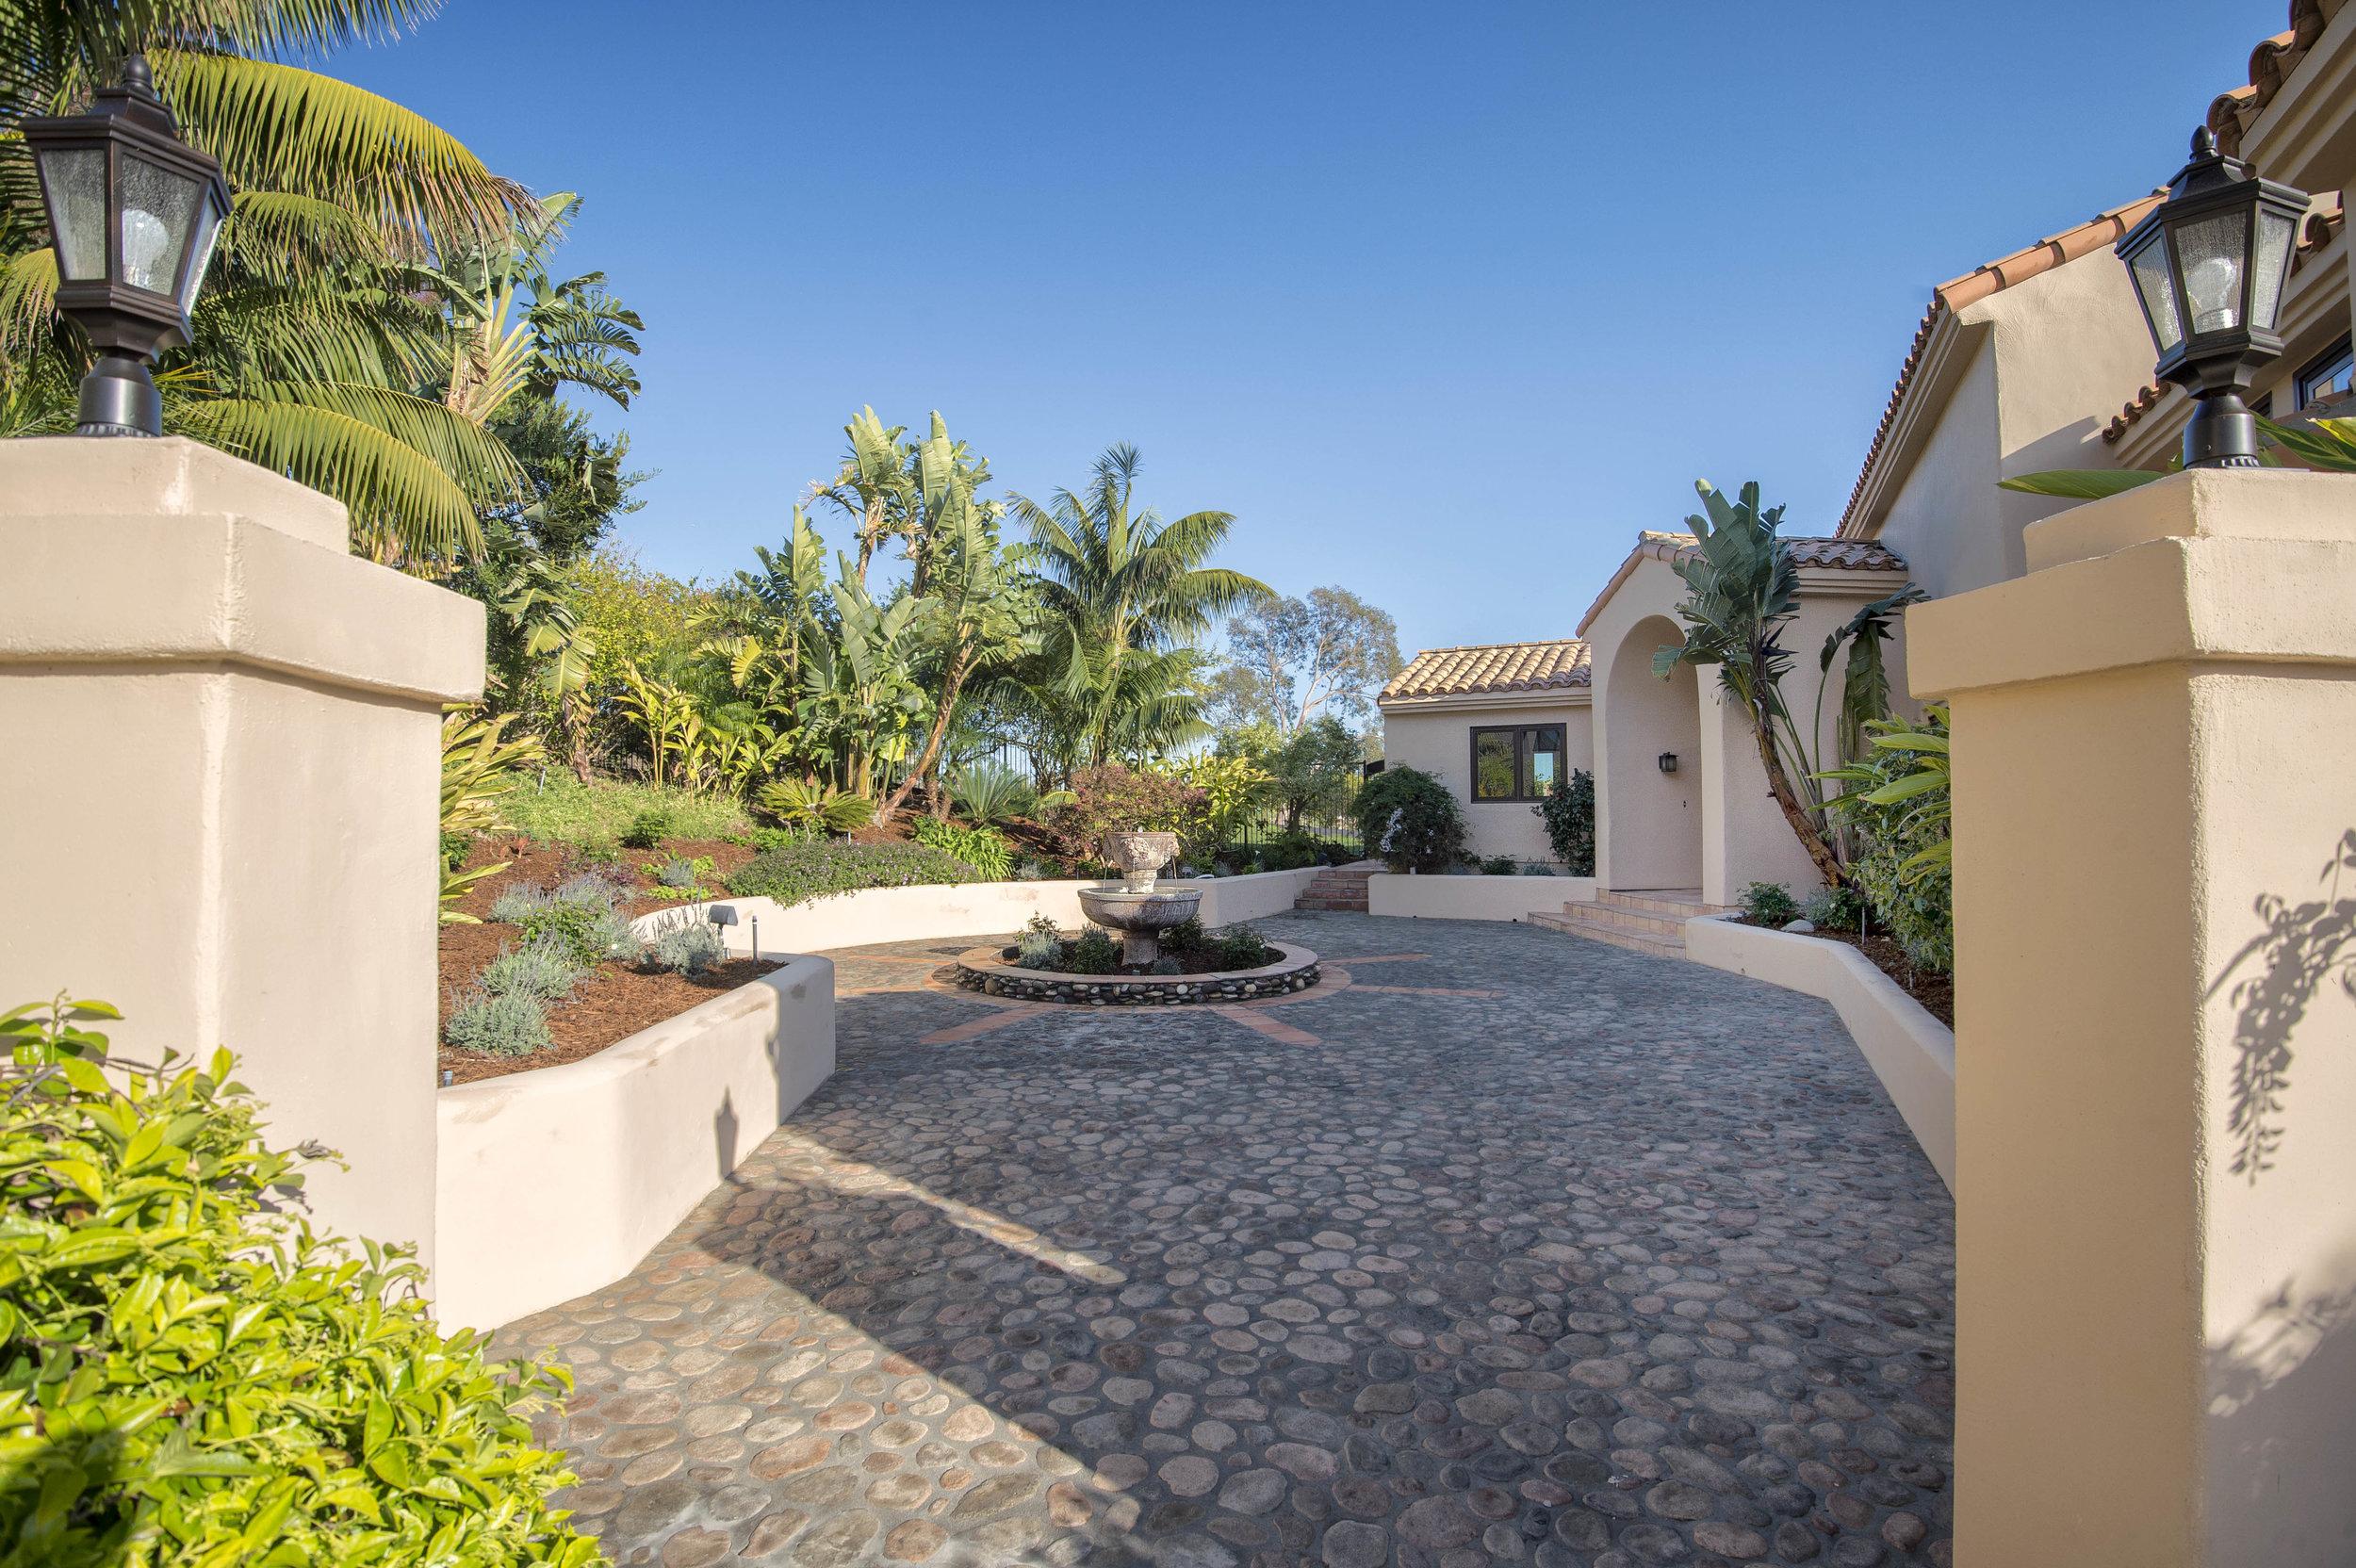 021 Driveway 6130 Via Cabrillo For Sale Lease The Malibu Life Team Luxury Real Estate.jpg